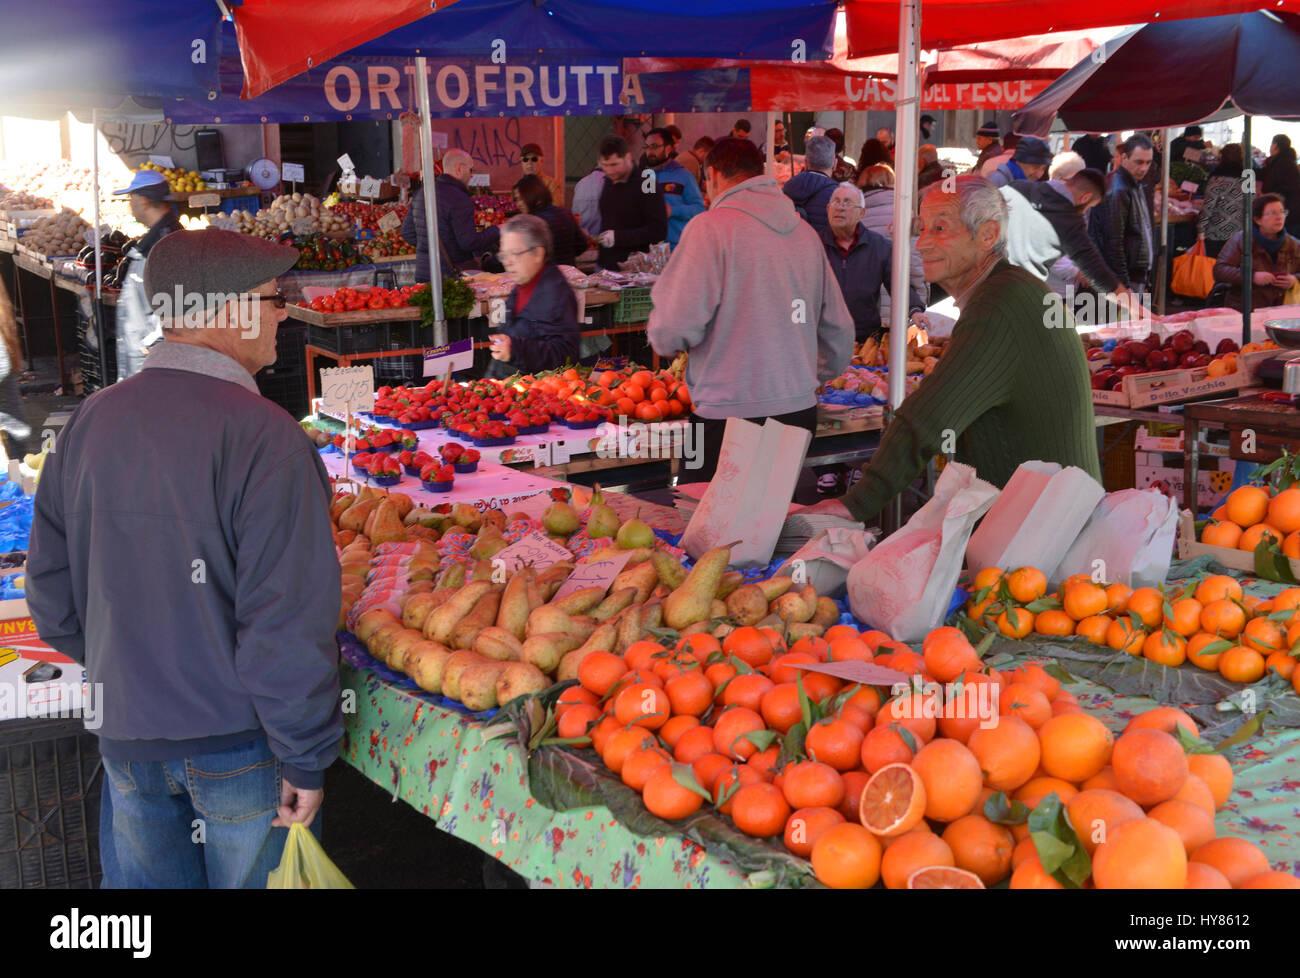 Fruits, weekly market, Piazza Carlo Alberto di Savoia